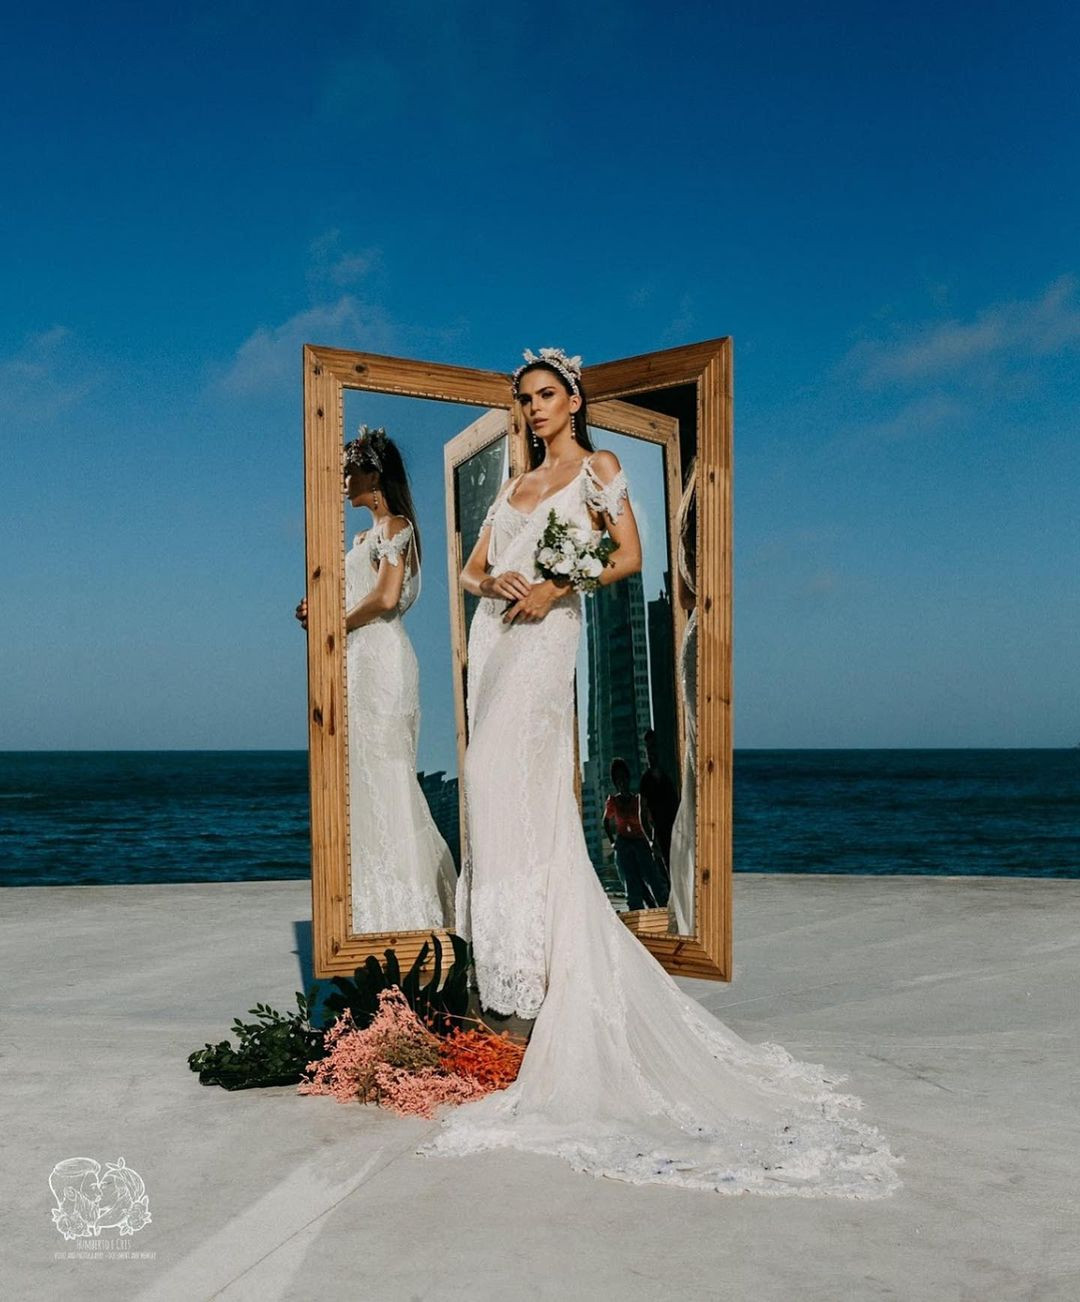 ana flavia giacomini, miss ilha dos lobos mundo 2019. Fvoei410